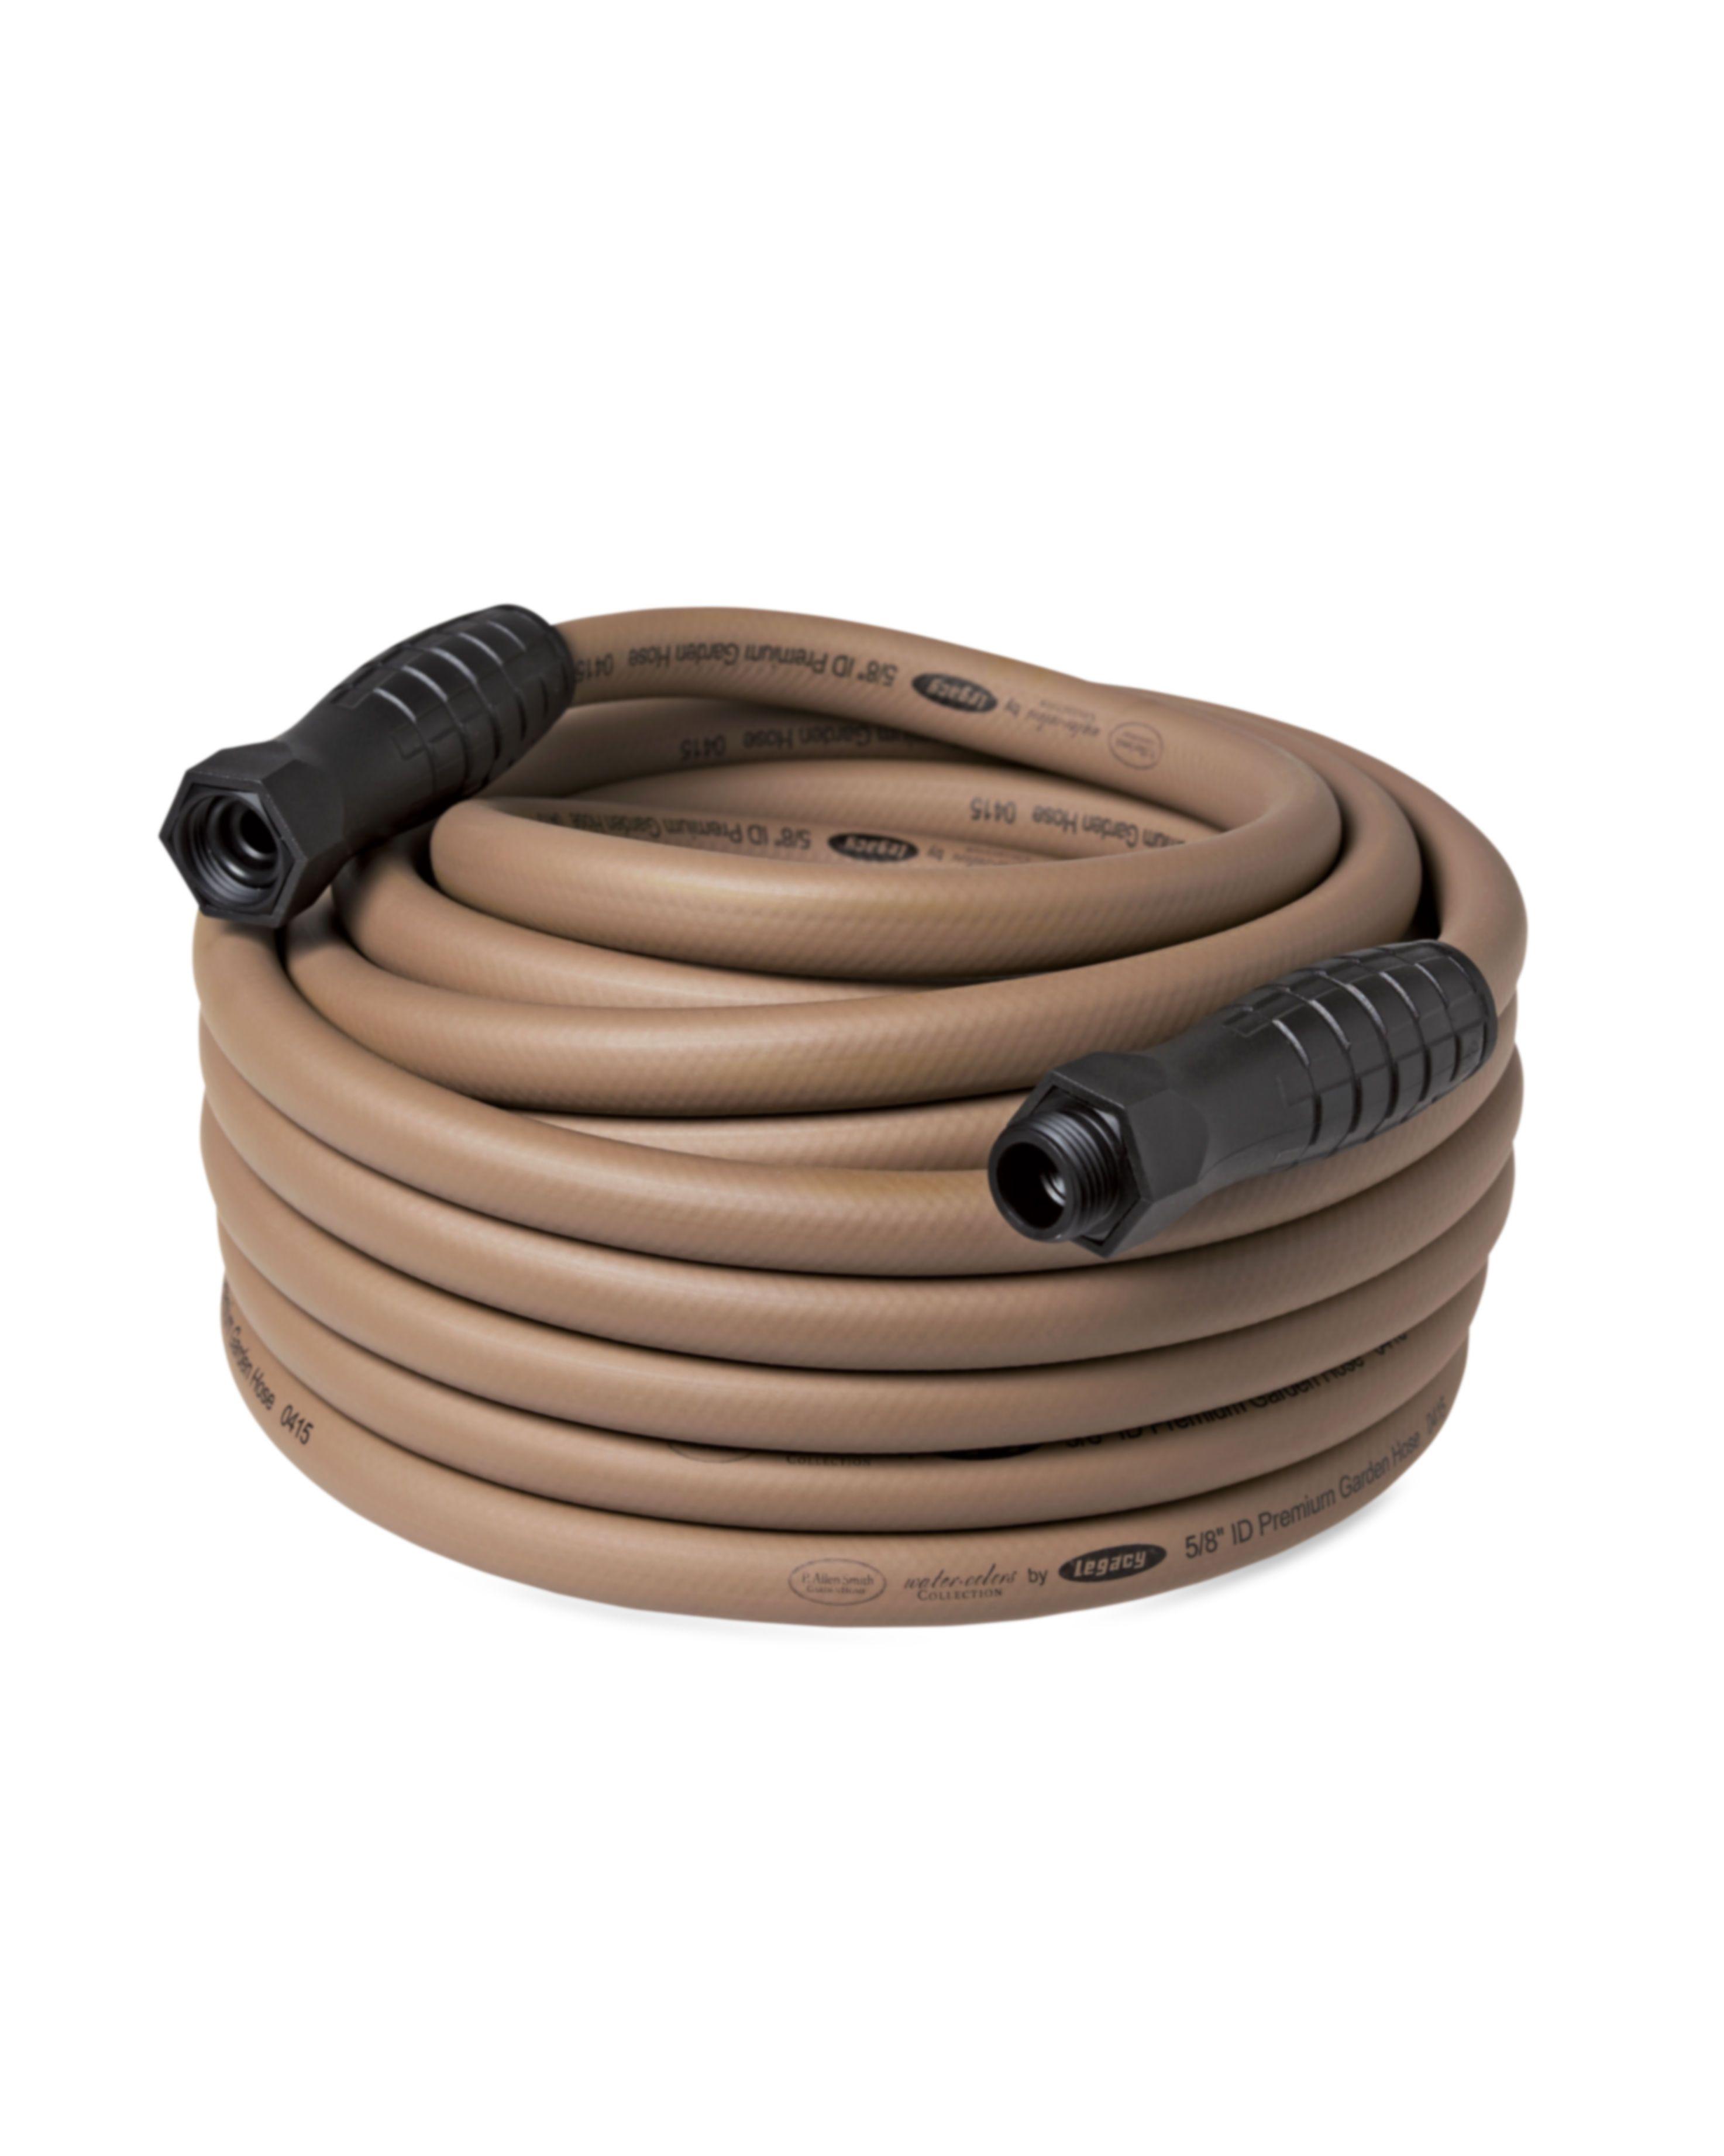 mini indoor garden hose sprayer with coil Indoor Plant Watering Hose - Mini Coil Indoor Garden Hose